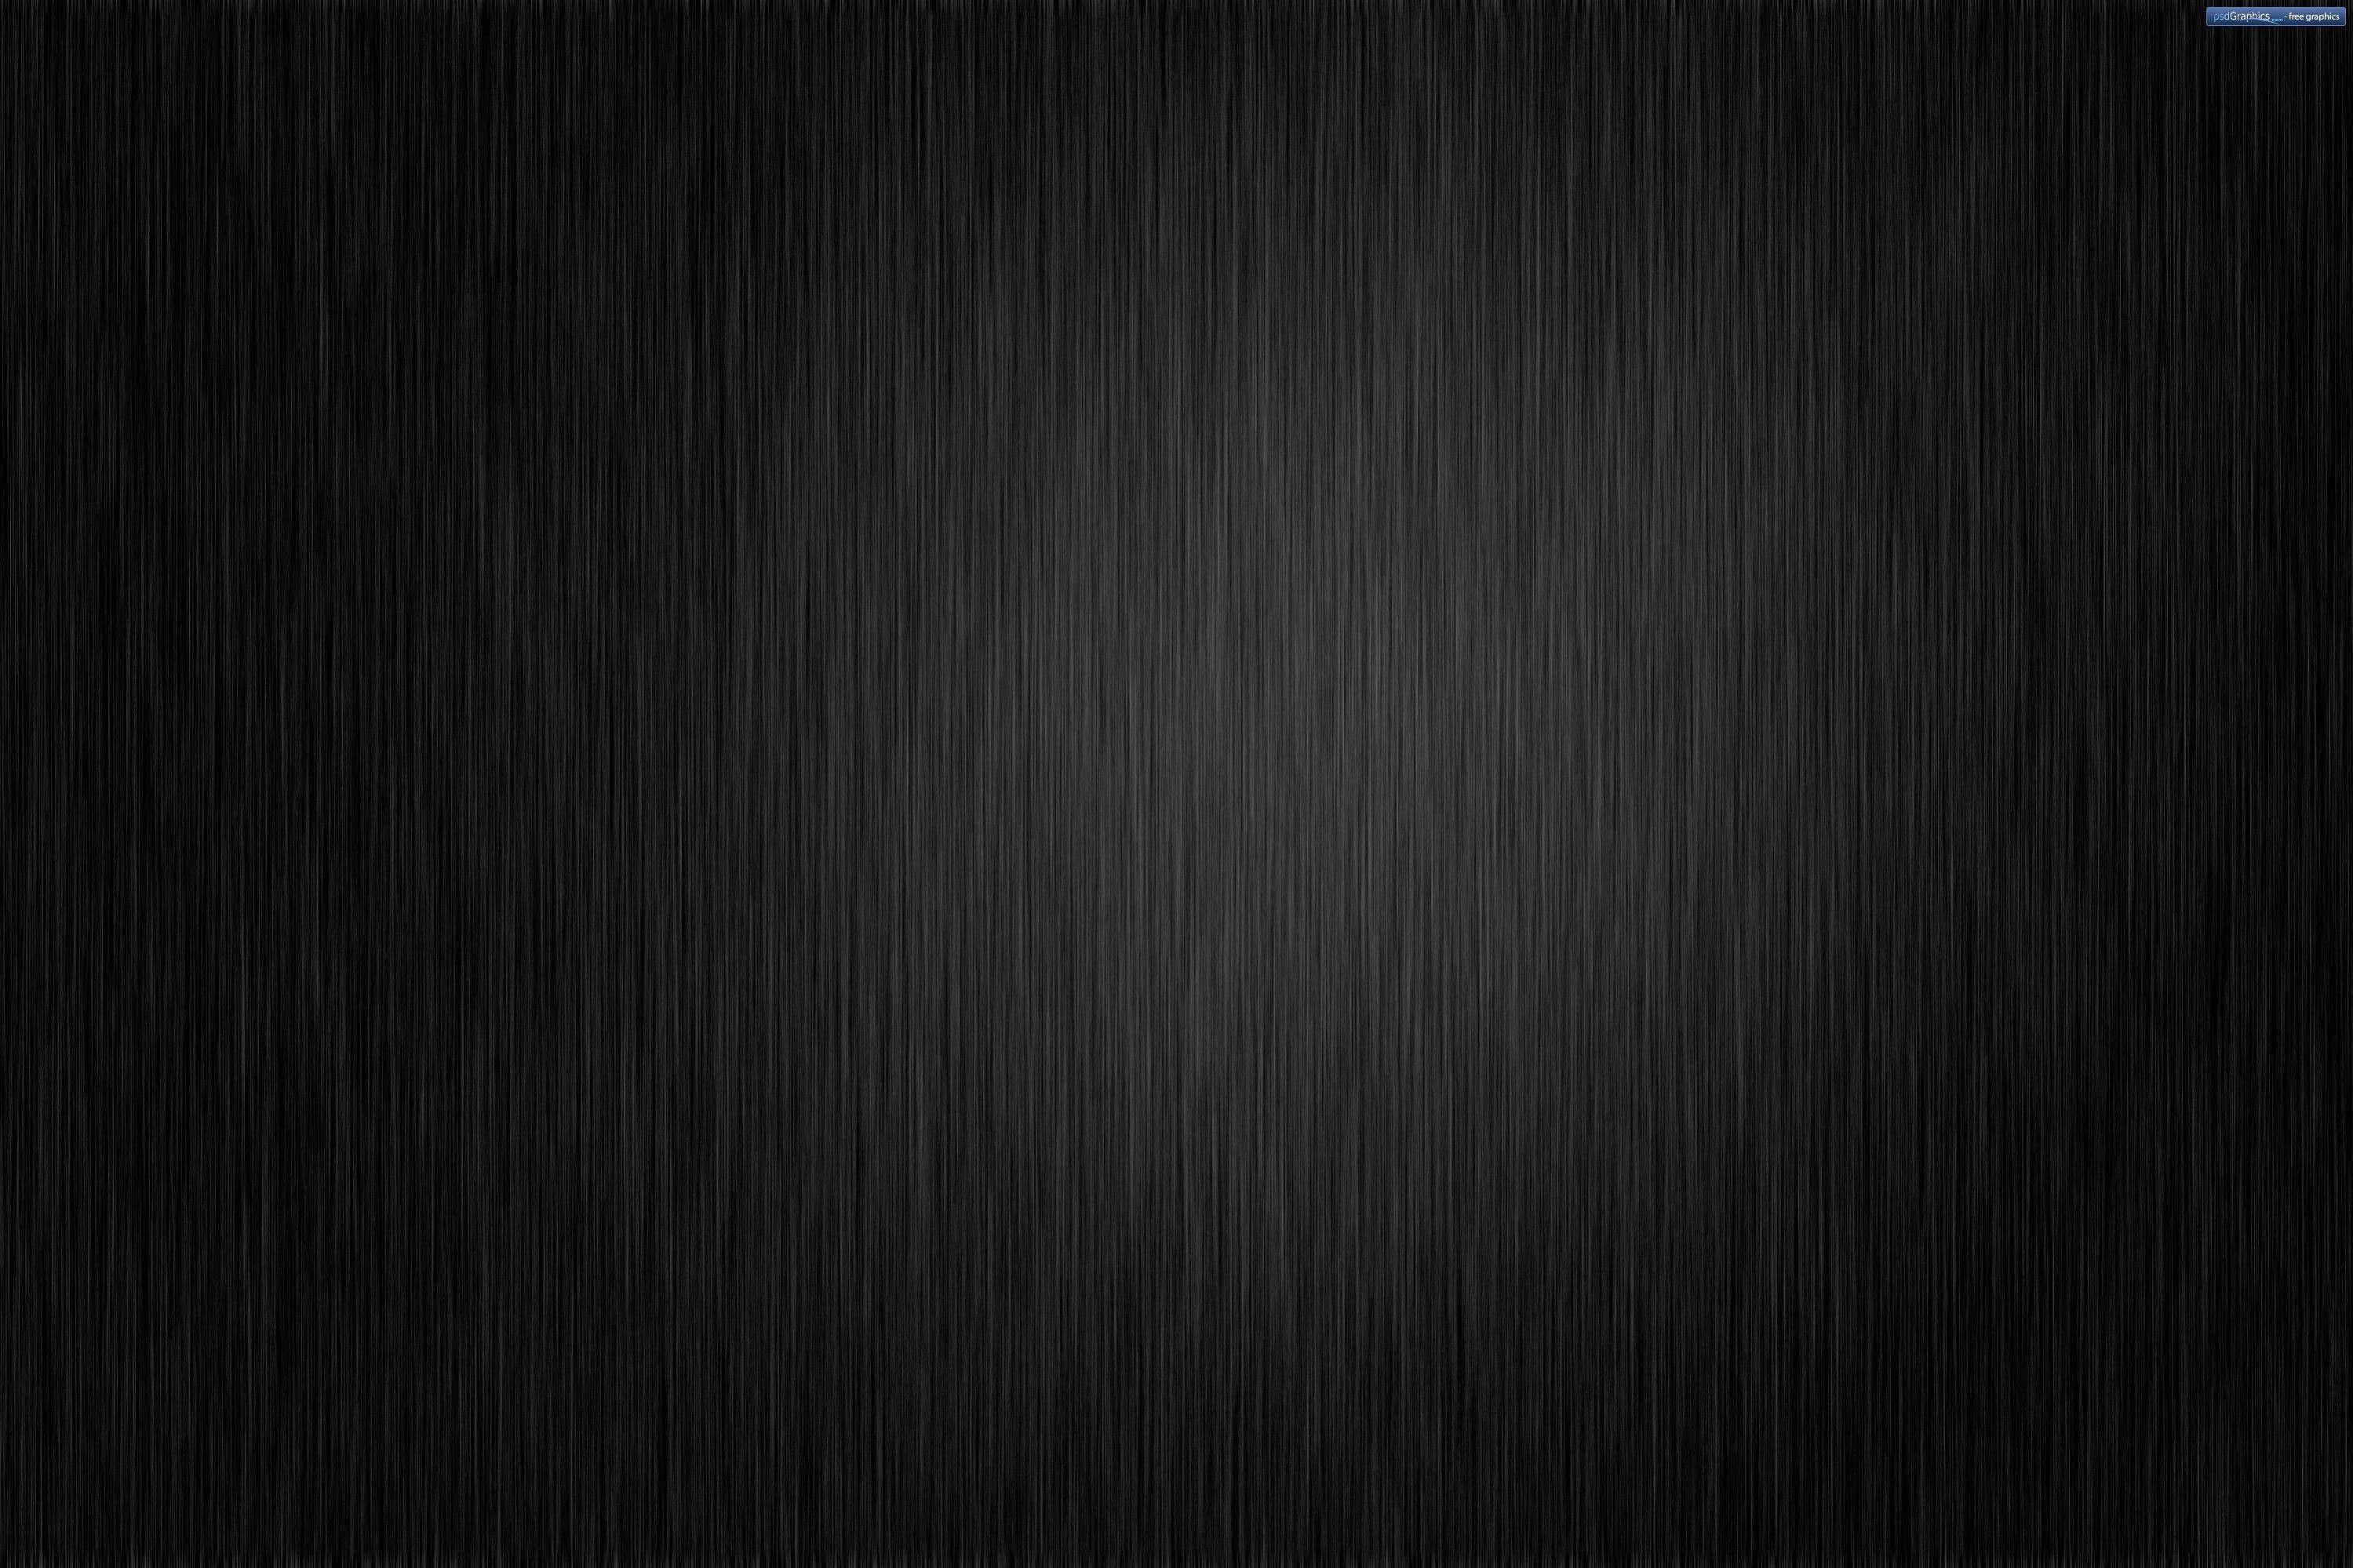 4k Carbon Fiber Wallpaper 2999x1999 Full Hd Black Hd Wallpaper Grey Wallpaper Android Black Wallpaper